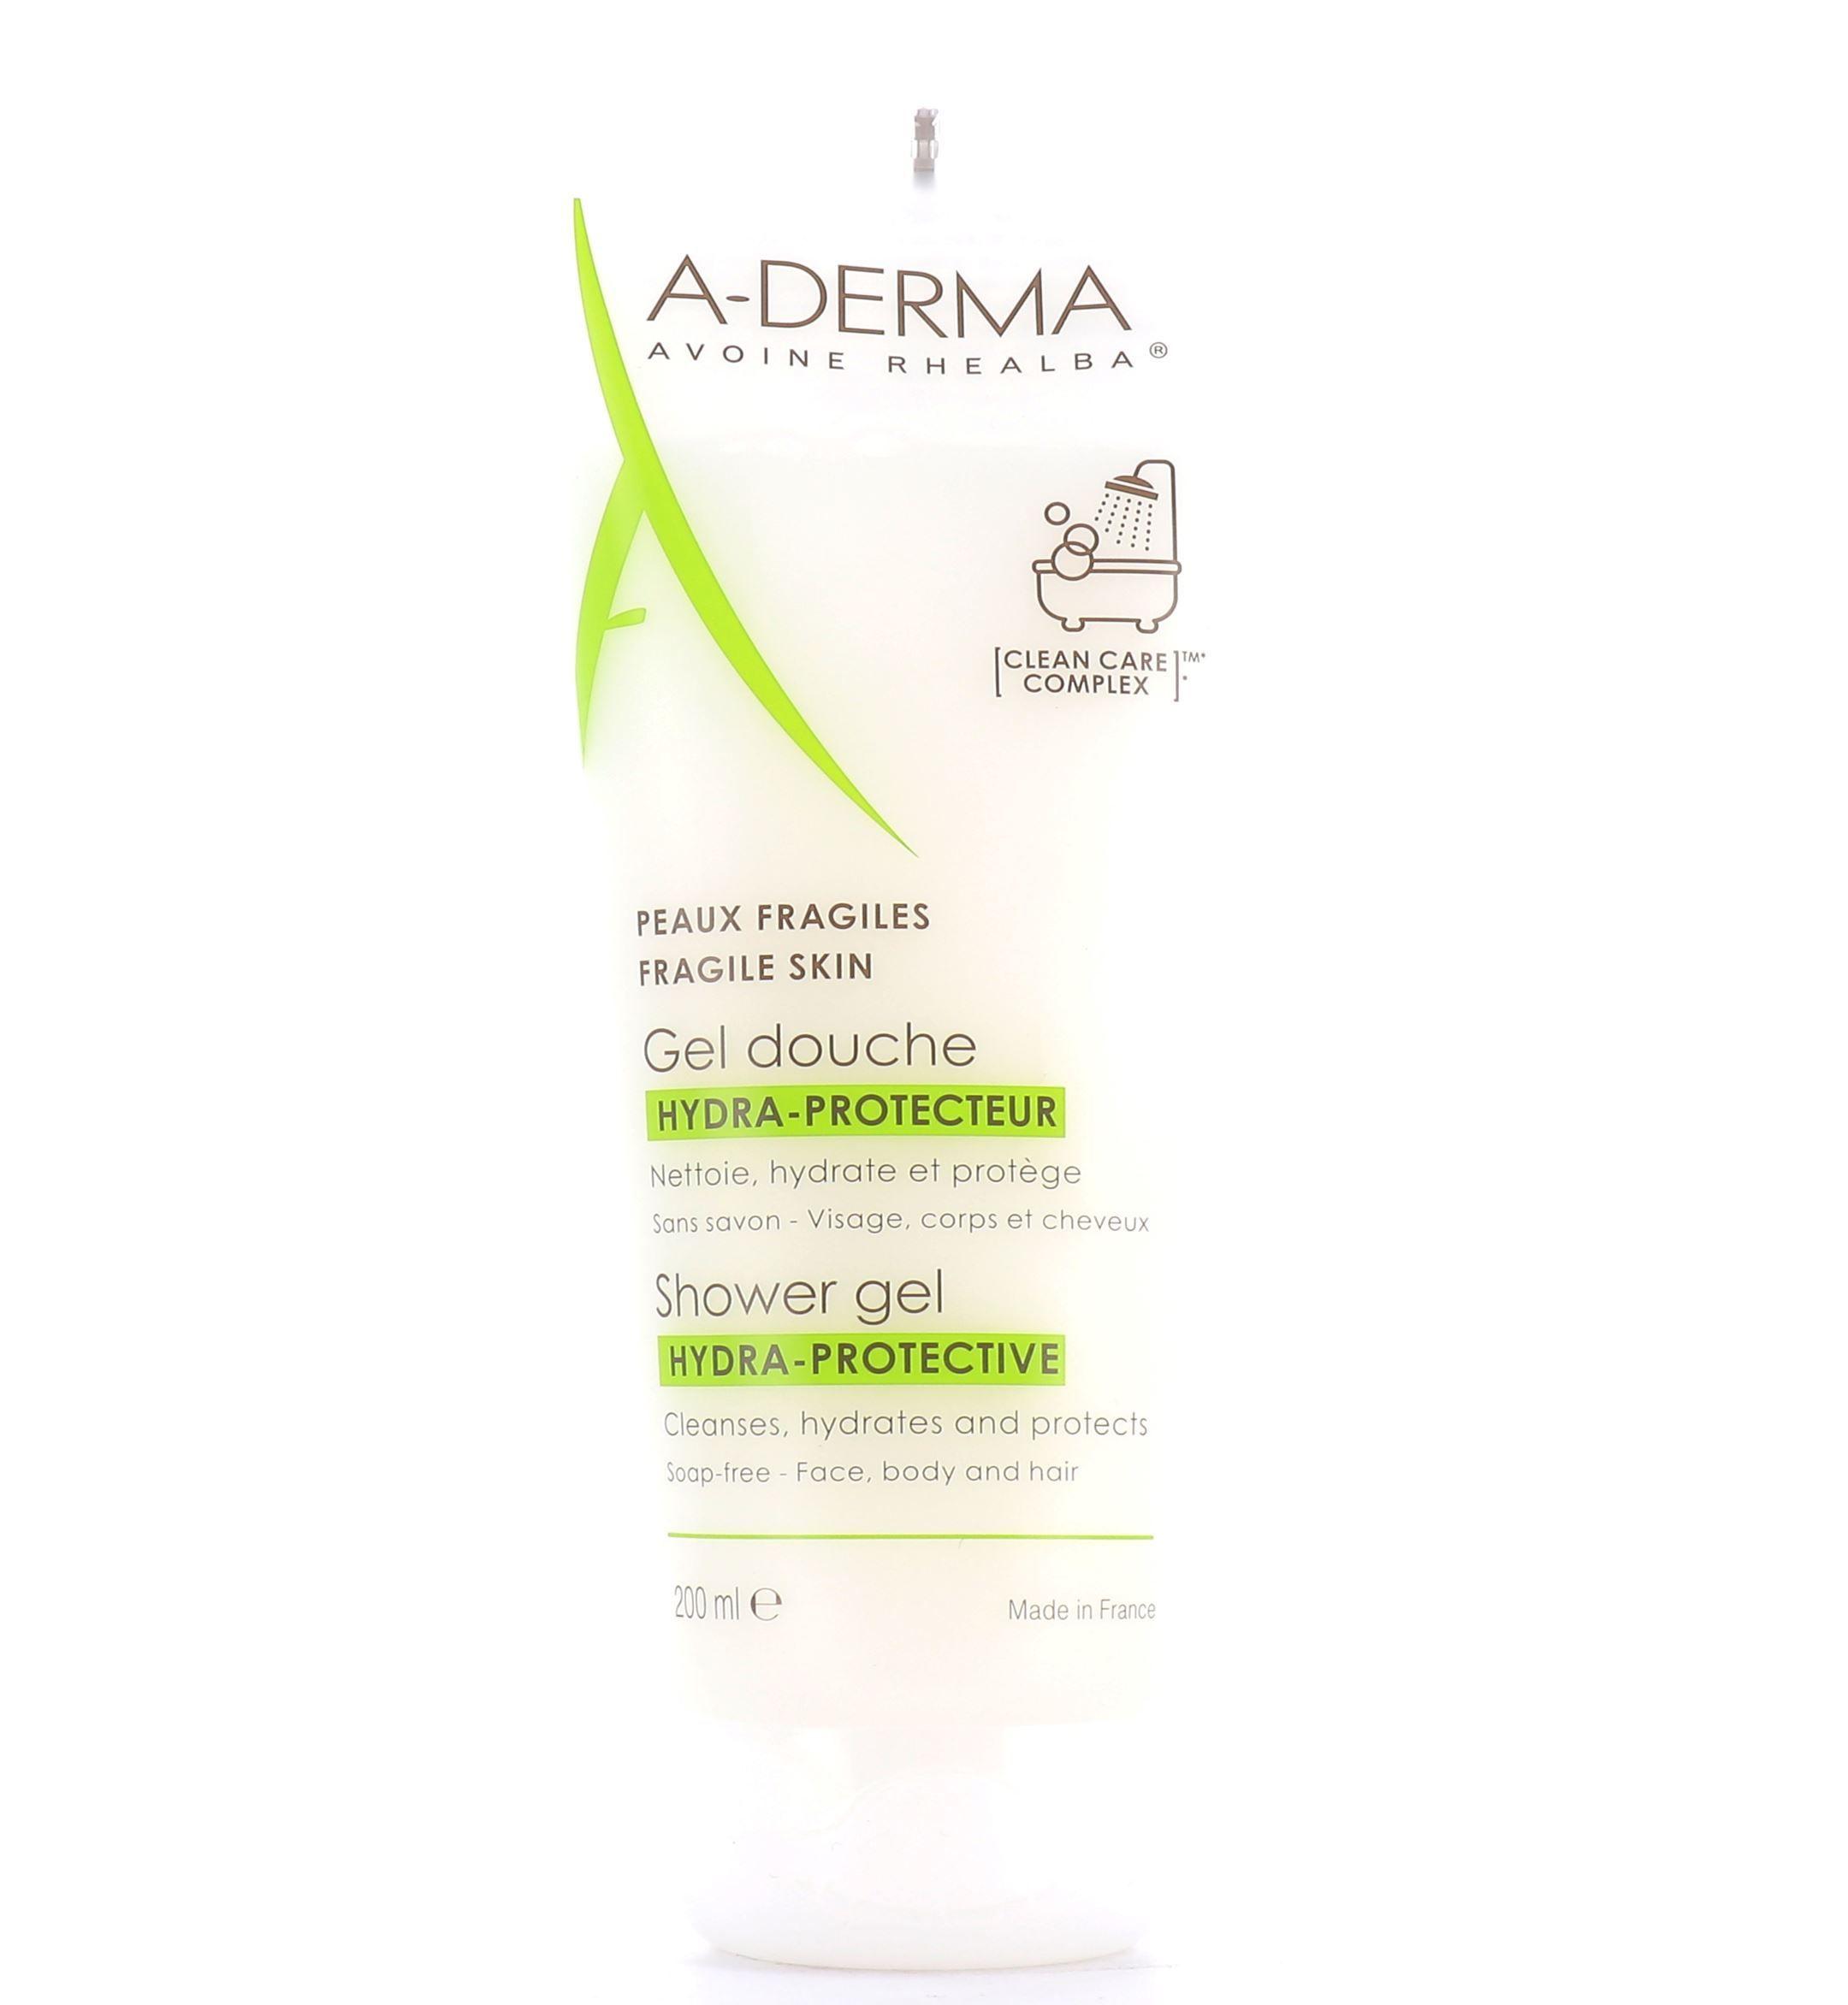 ADerma Hydra-Protective Shower Gel 200ml